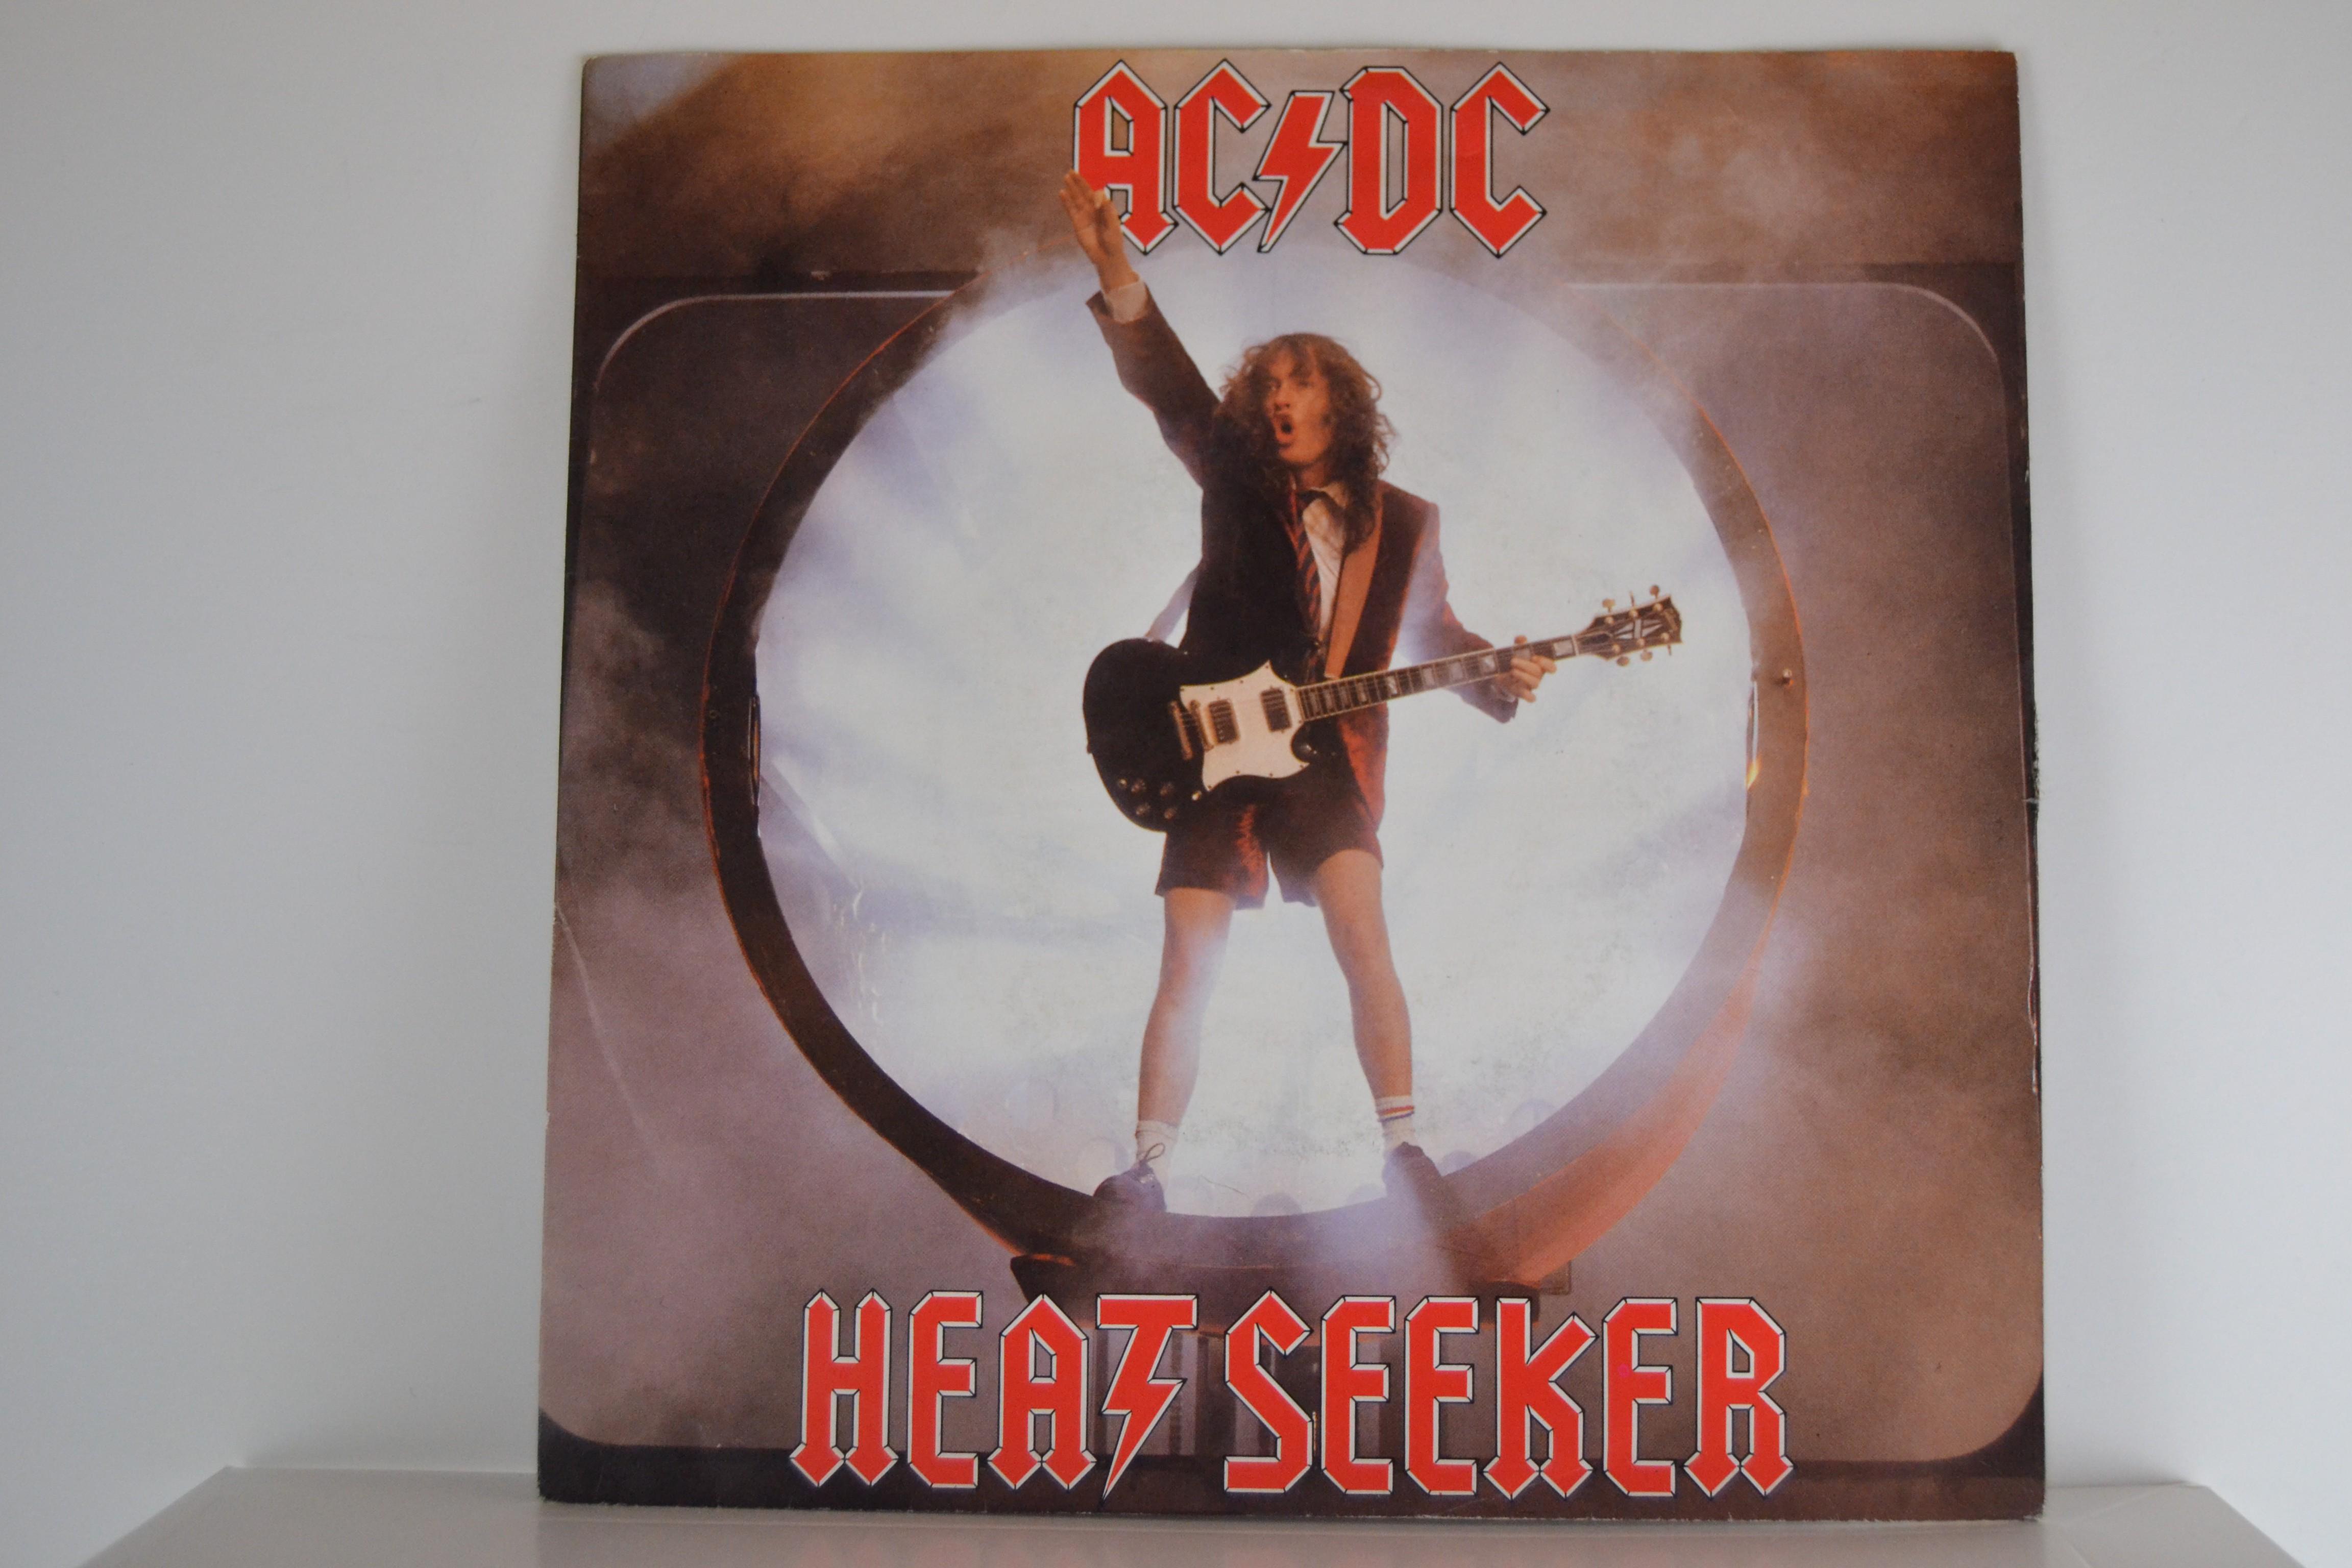 AC / DC : Heatseeker / Go zone